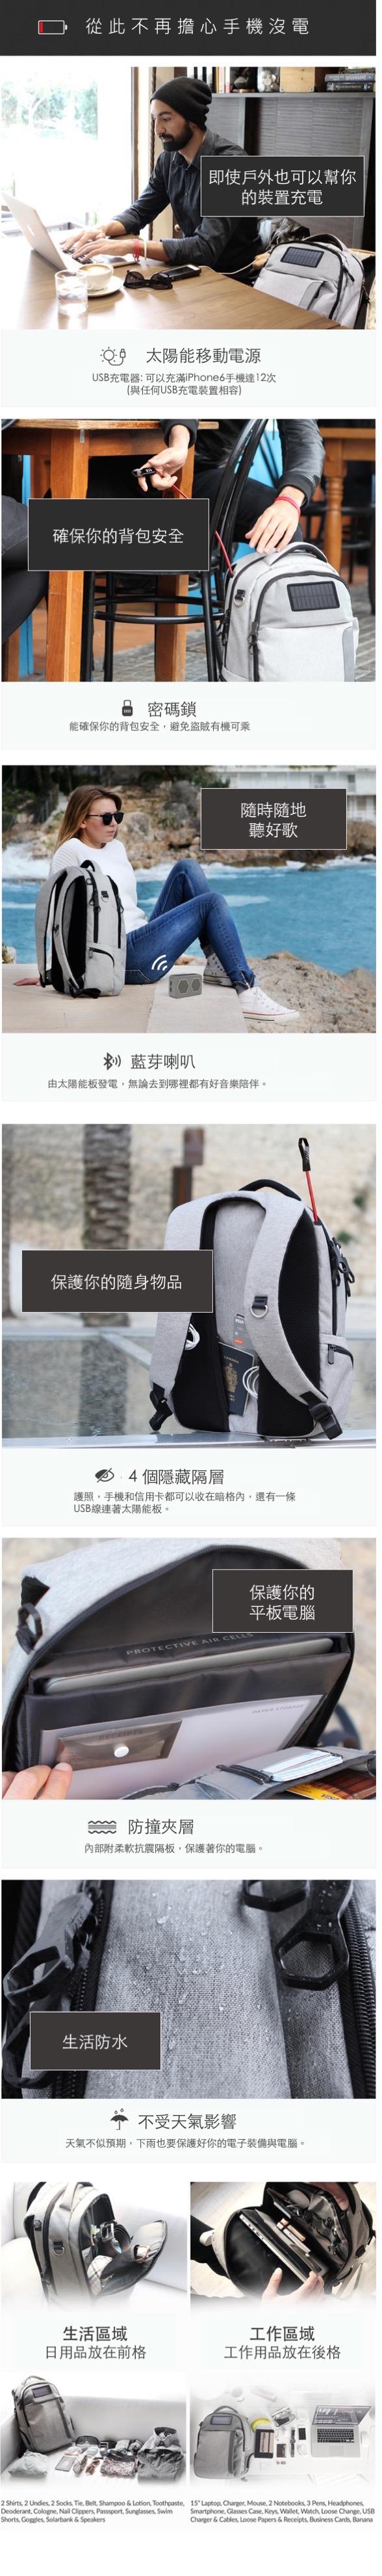 lifepack-1